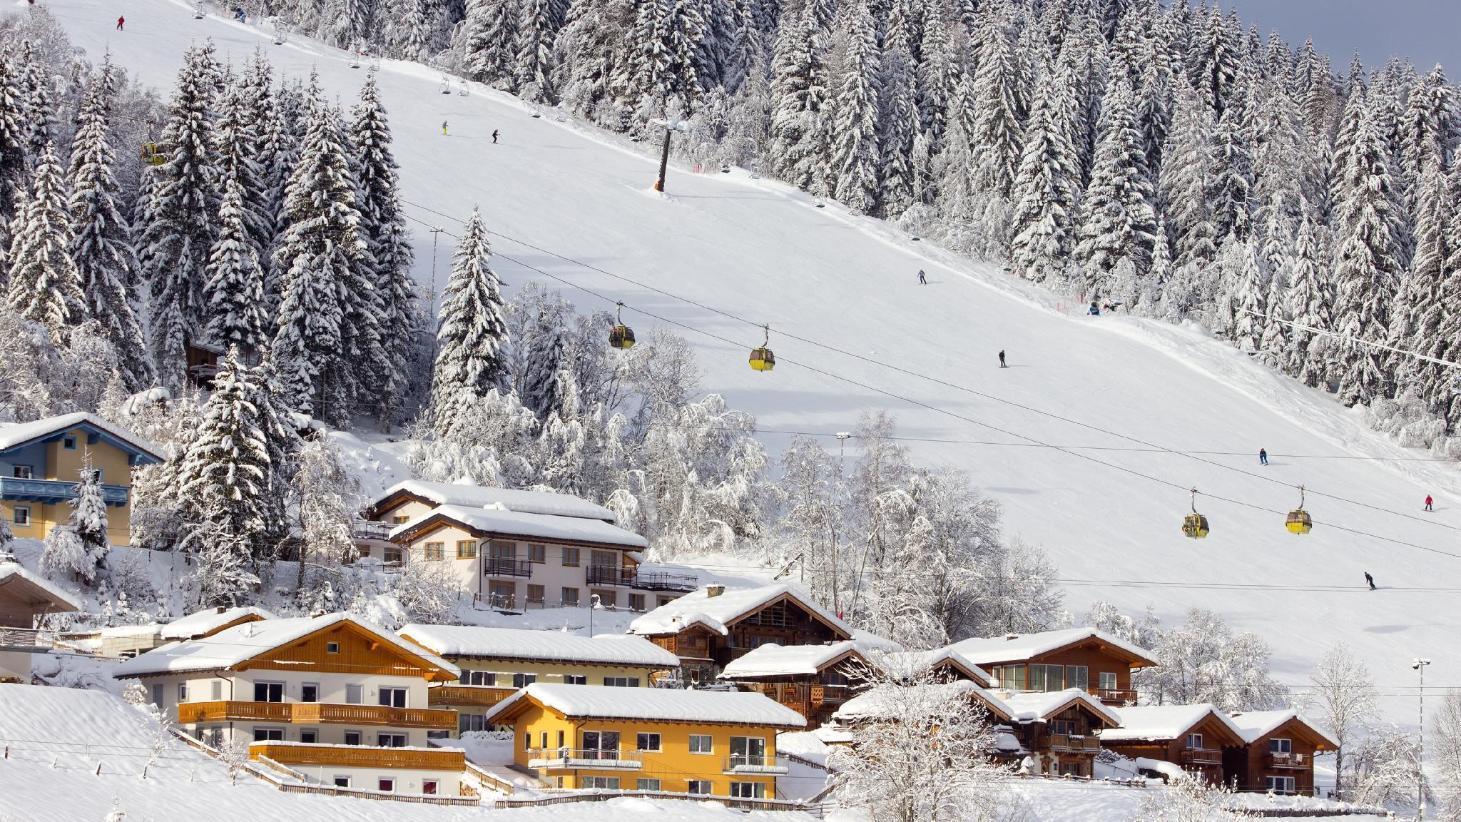 30 Best Flachau Hotels - Free Cancellation, 2020 Price Lists & Reviews of  the Best Hotels in Flachau, Austria